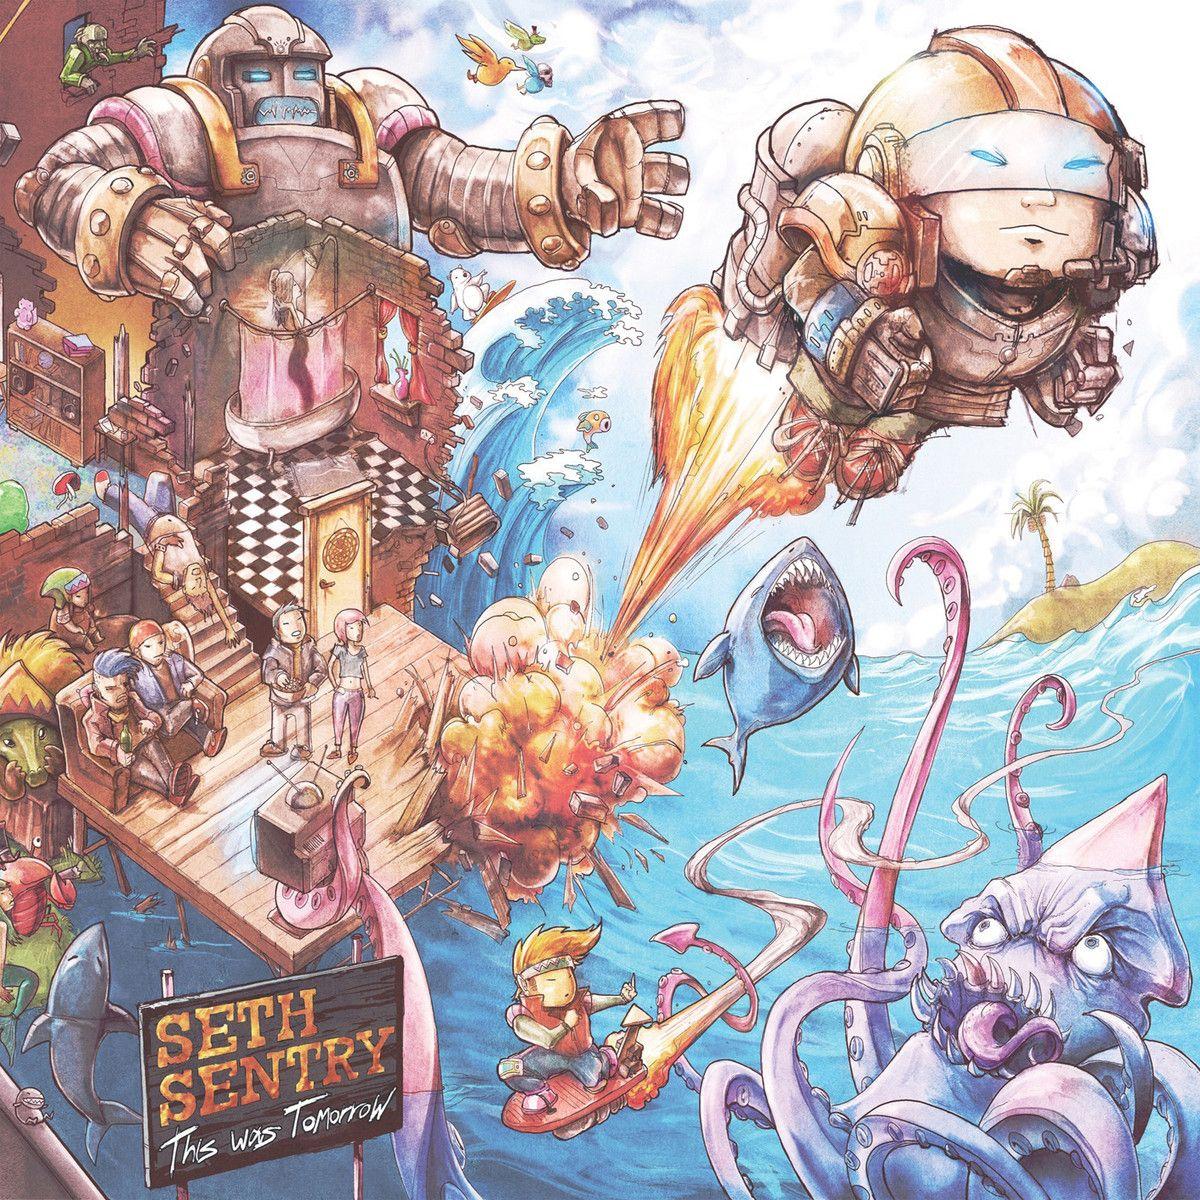 Seth Sentry This Was Tomorrow Music Artwork Cool Things To Buy Triple J Hottest 100